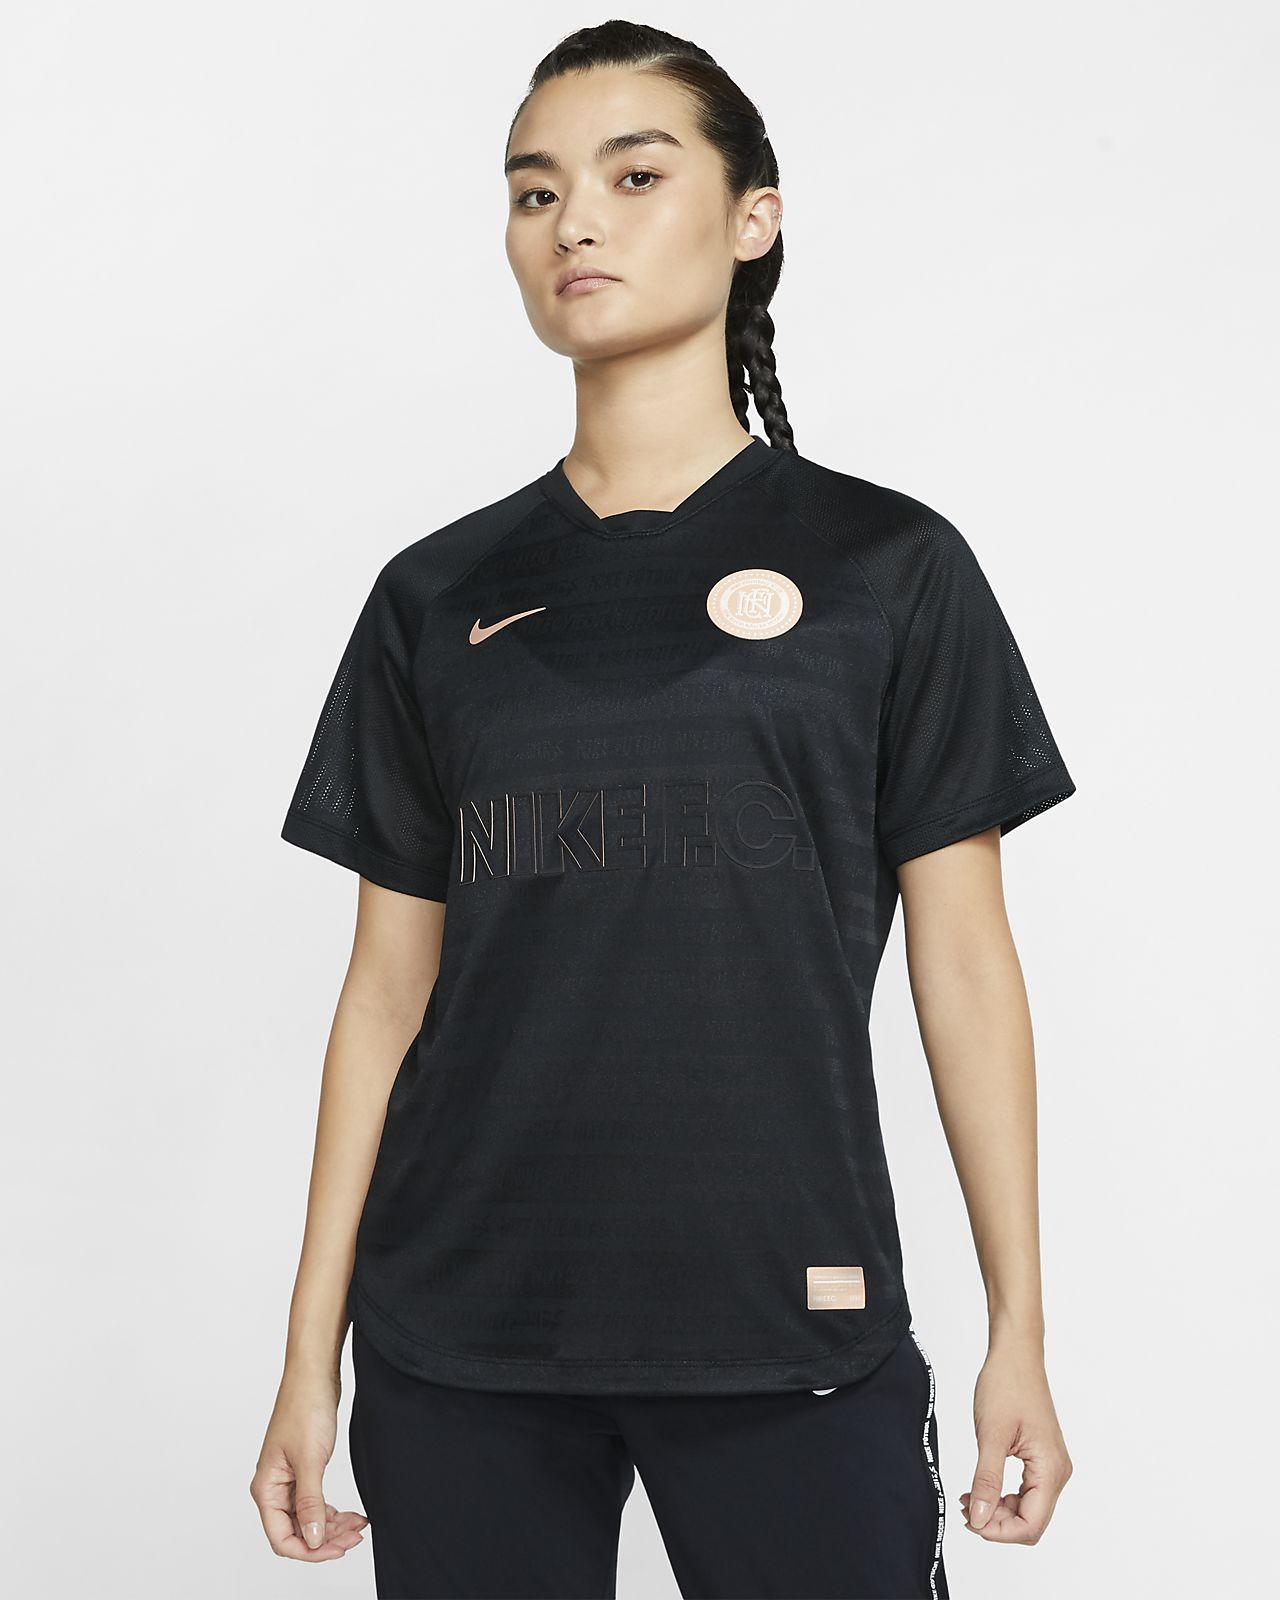 Camiseta de fútbol para mujer Nike F.C. Dri-FIT